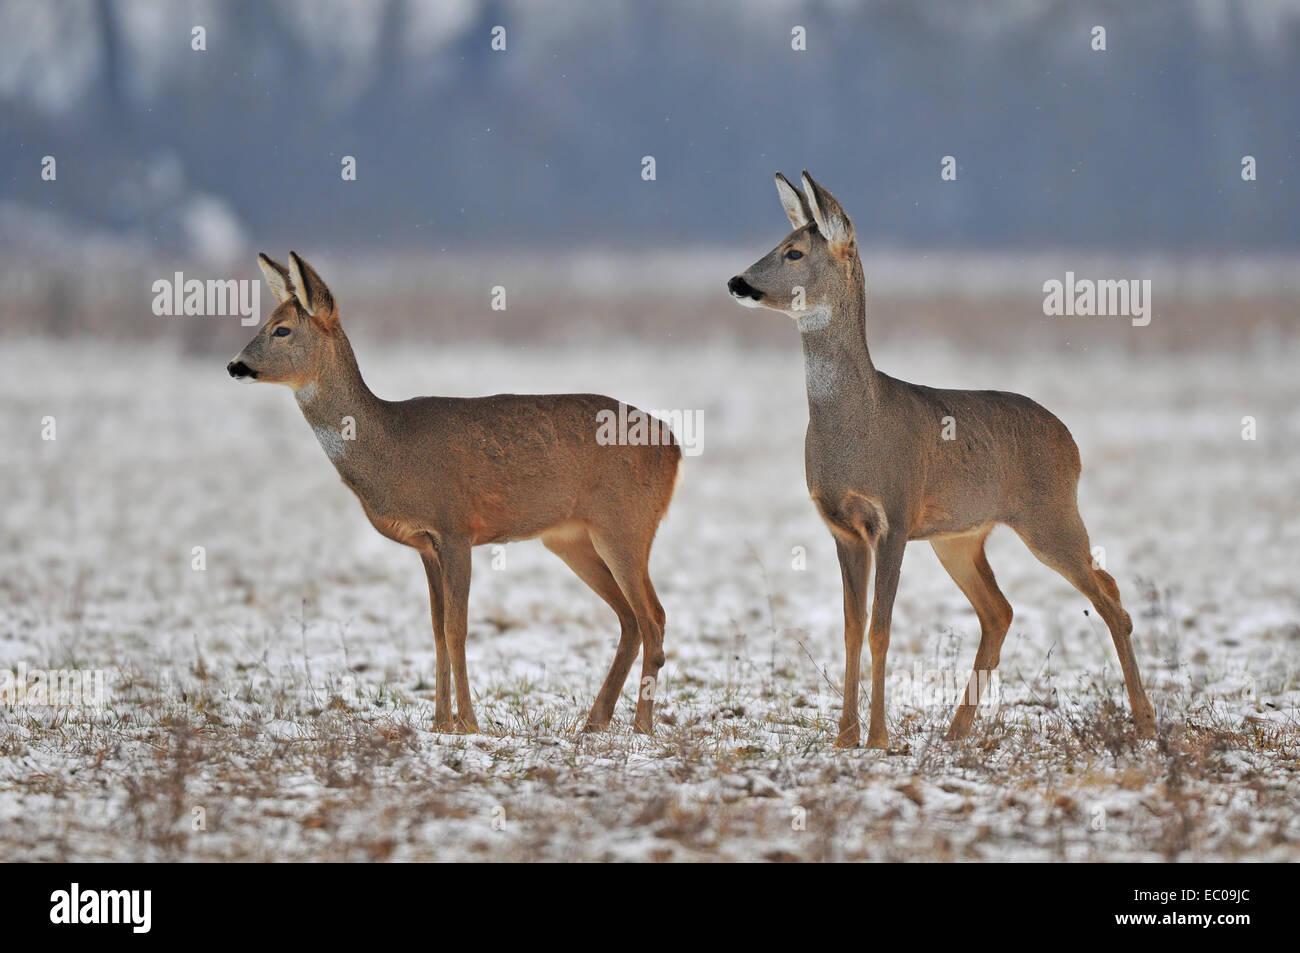 Roe deer in winter - Stock Image